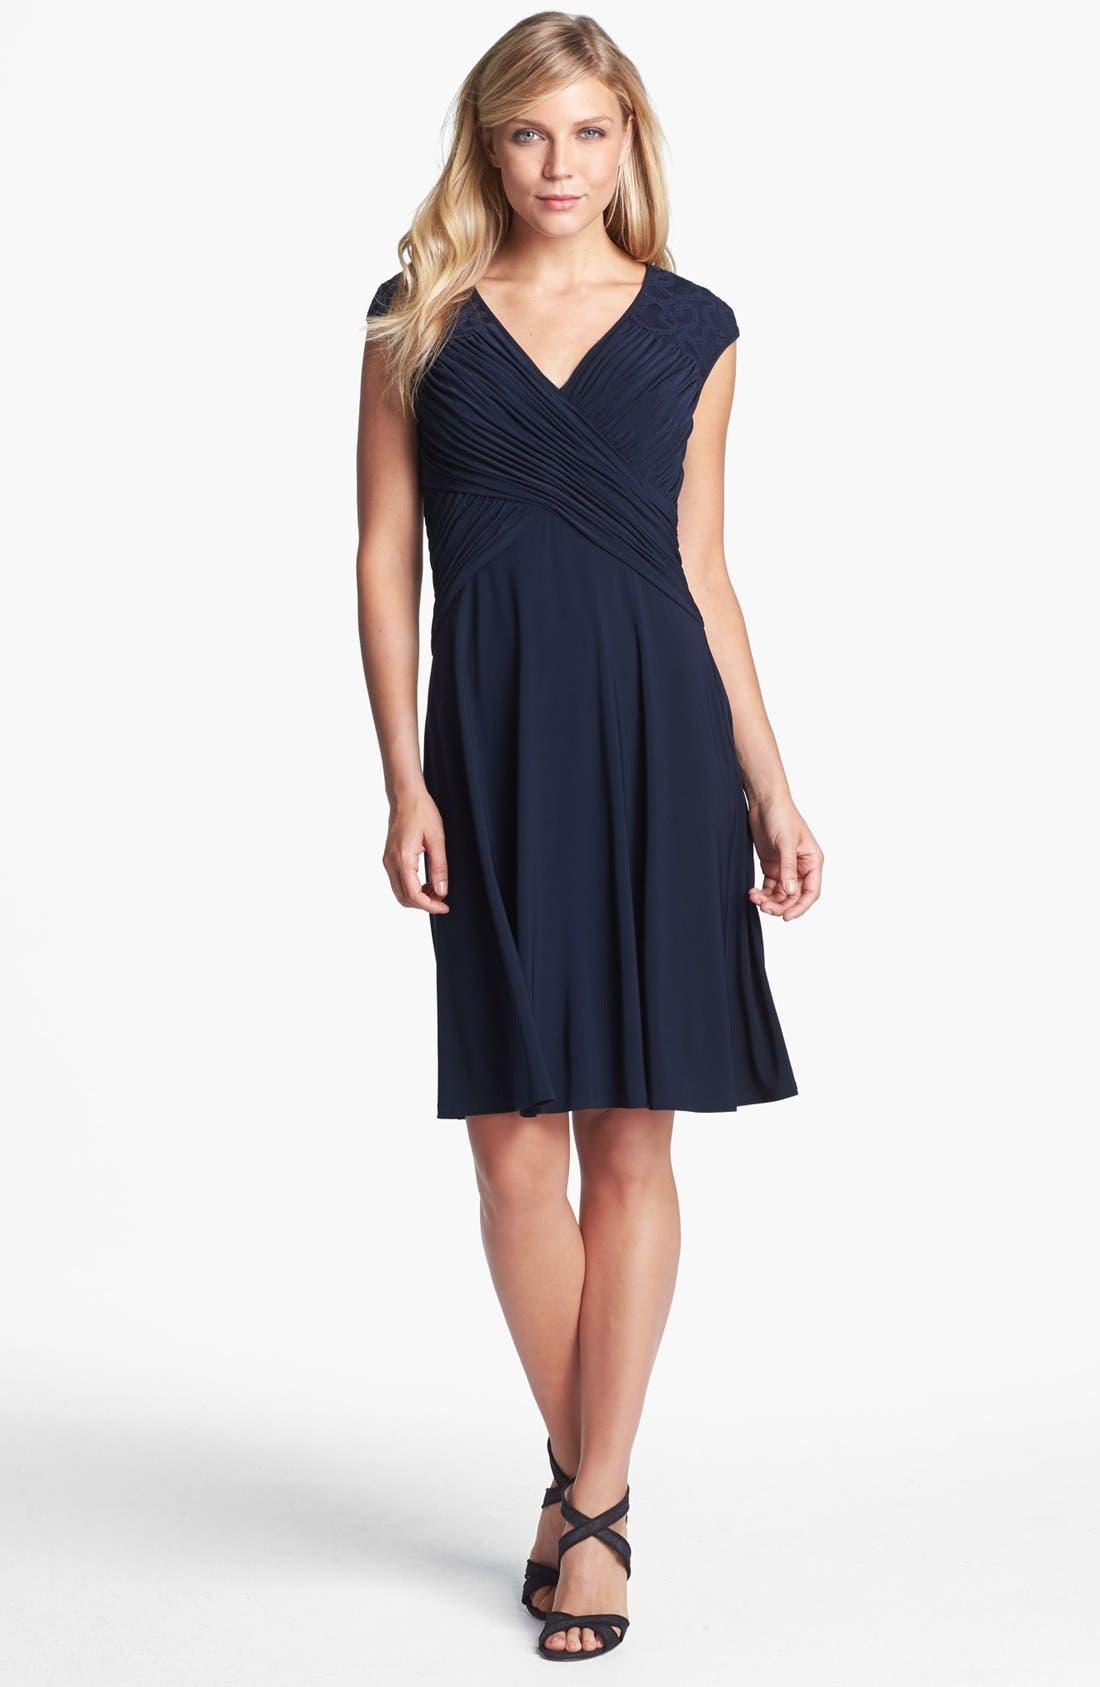 Main Image - Adrianna Papell Lace Yoke Jersey Fit & Flare Dress